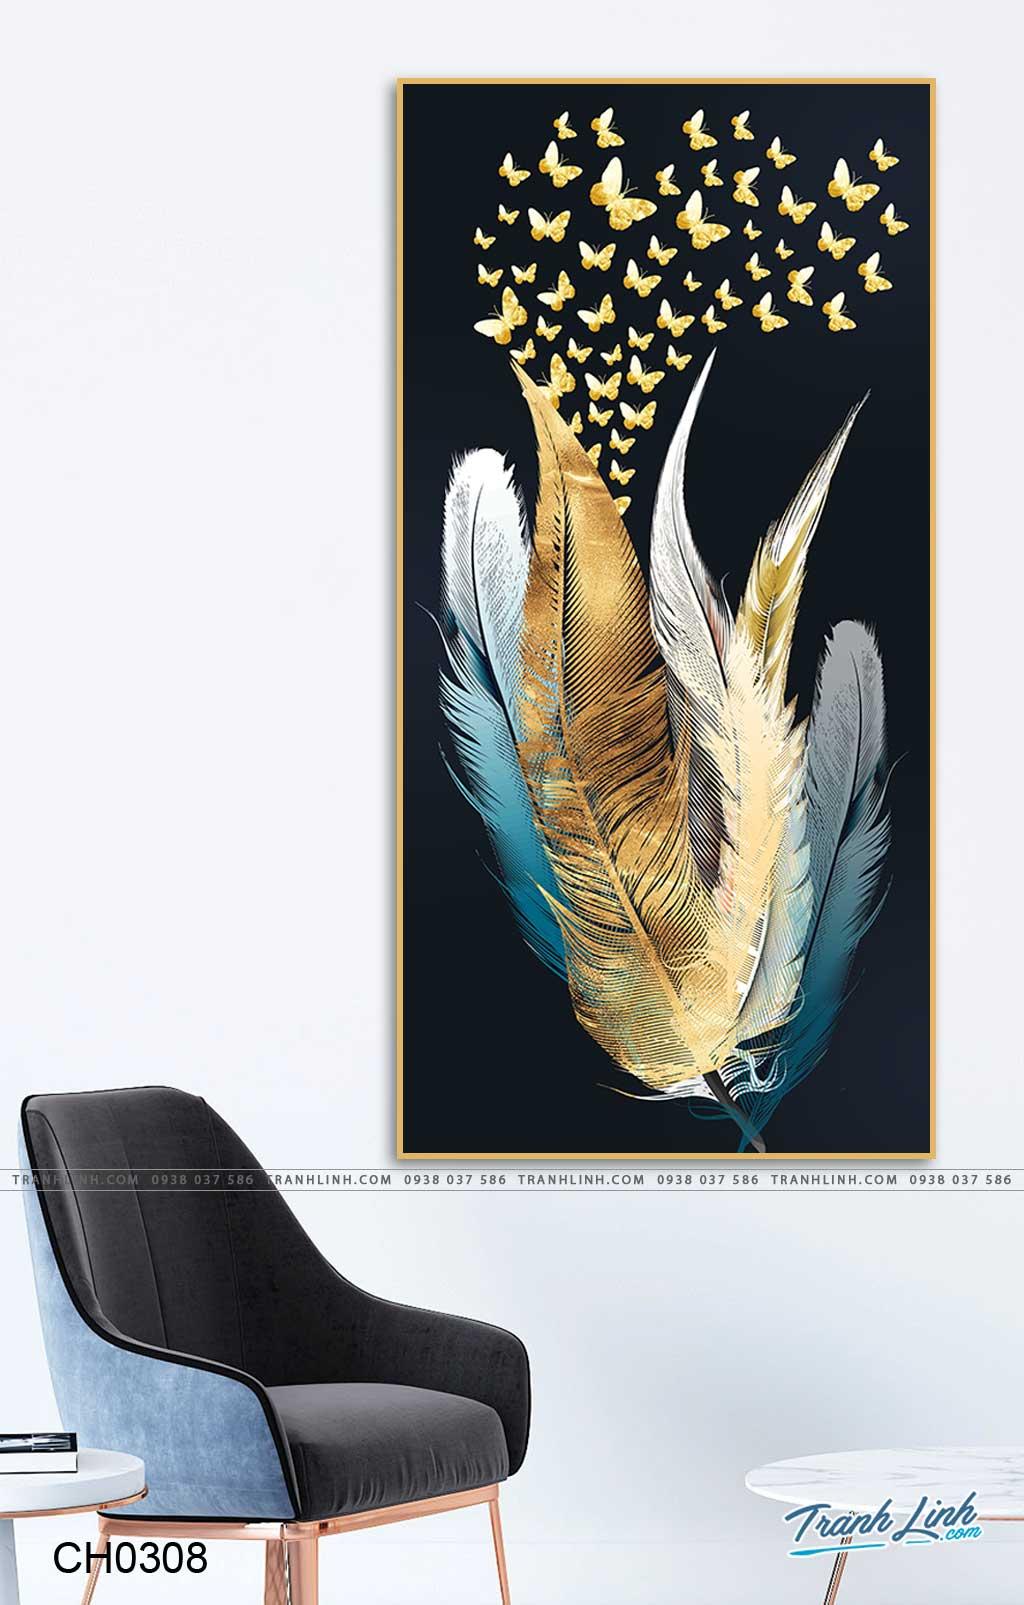 tranh chim long vu va dan buom 6